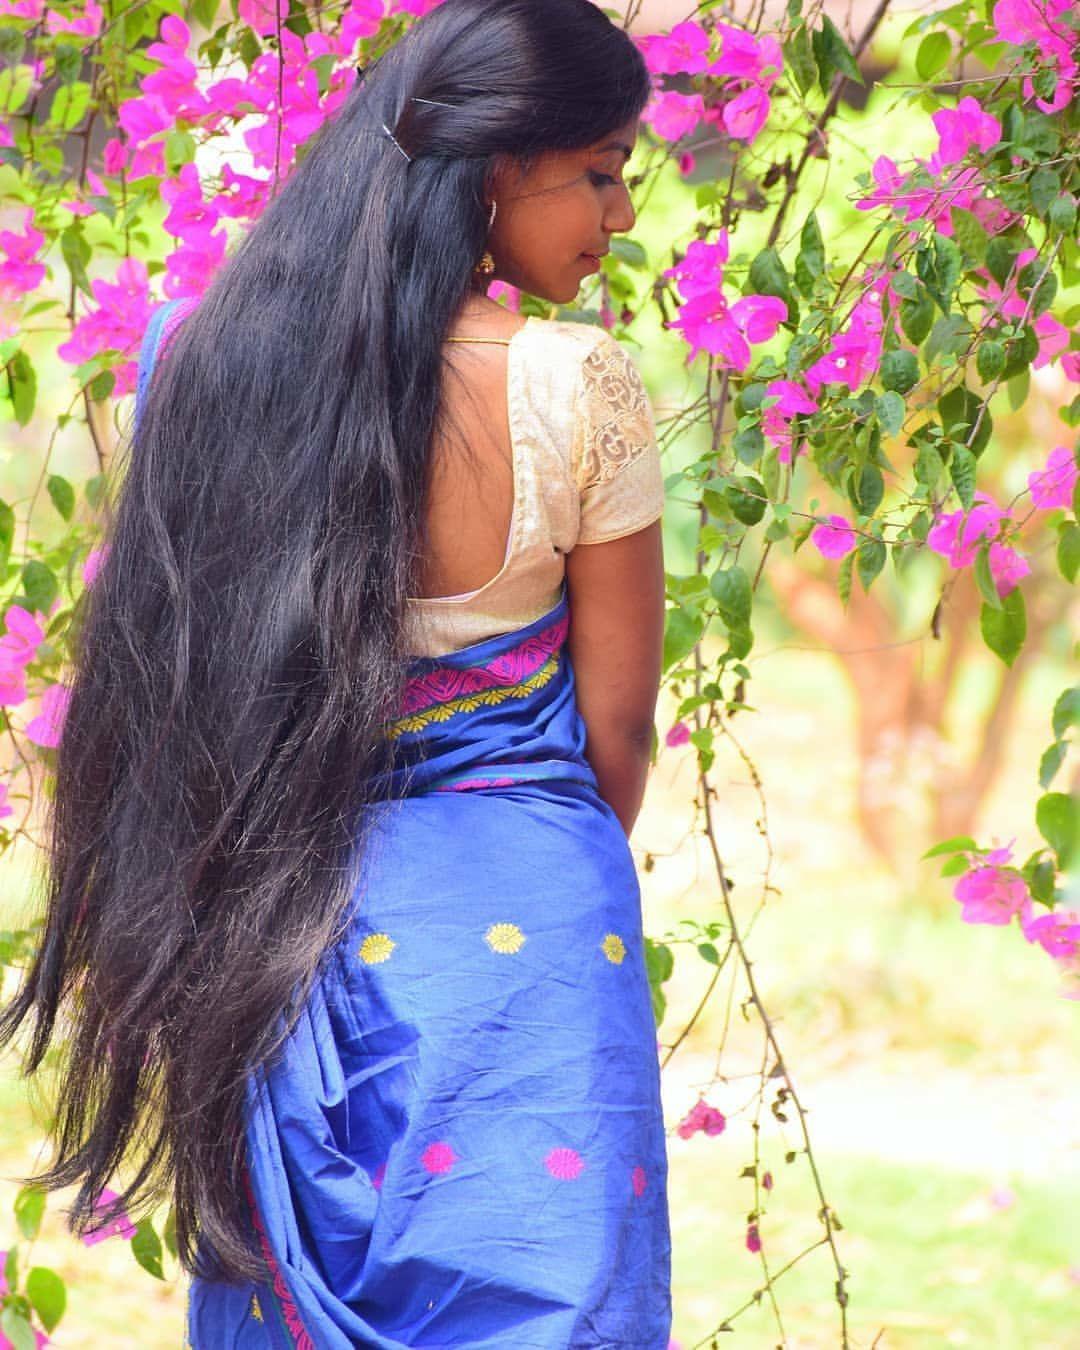 Lavish Long Hair On Instagram Lavishlonghair Your One And All Destination Of Beautiful Long Ha In 2020 Long Hair Styles Indian Long Hair Braid Braids For Long Hair